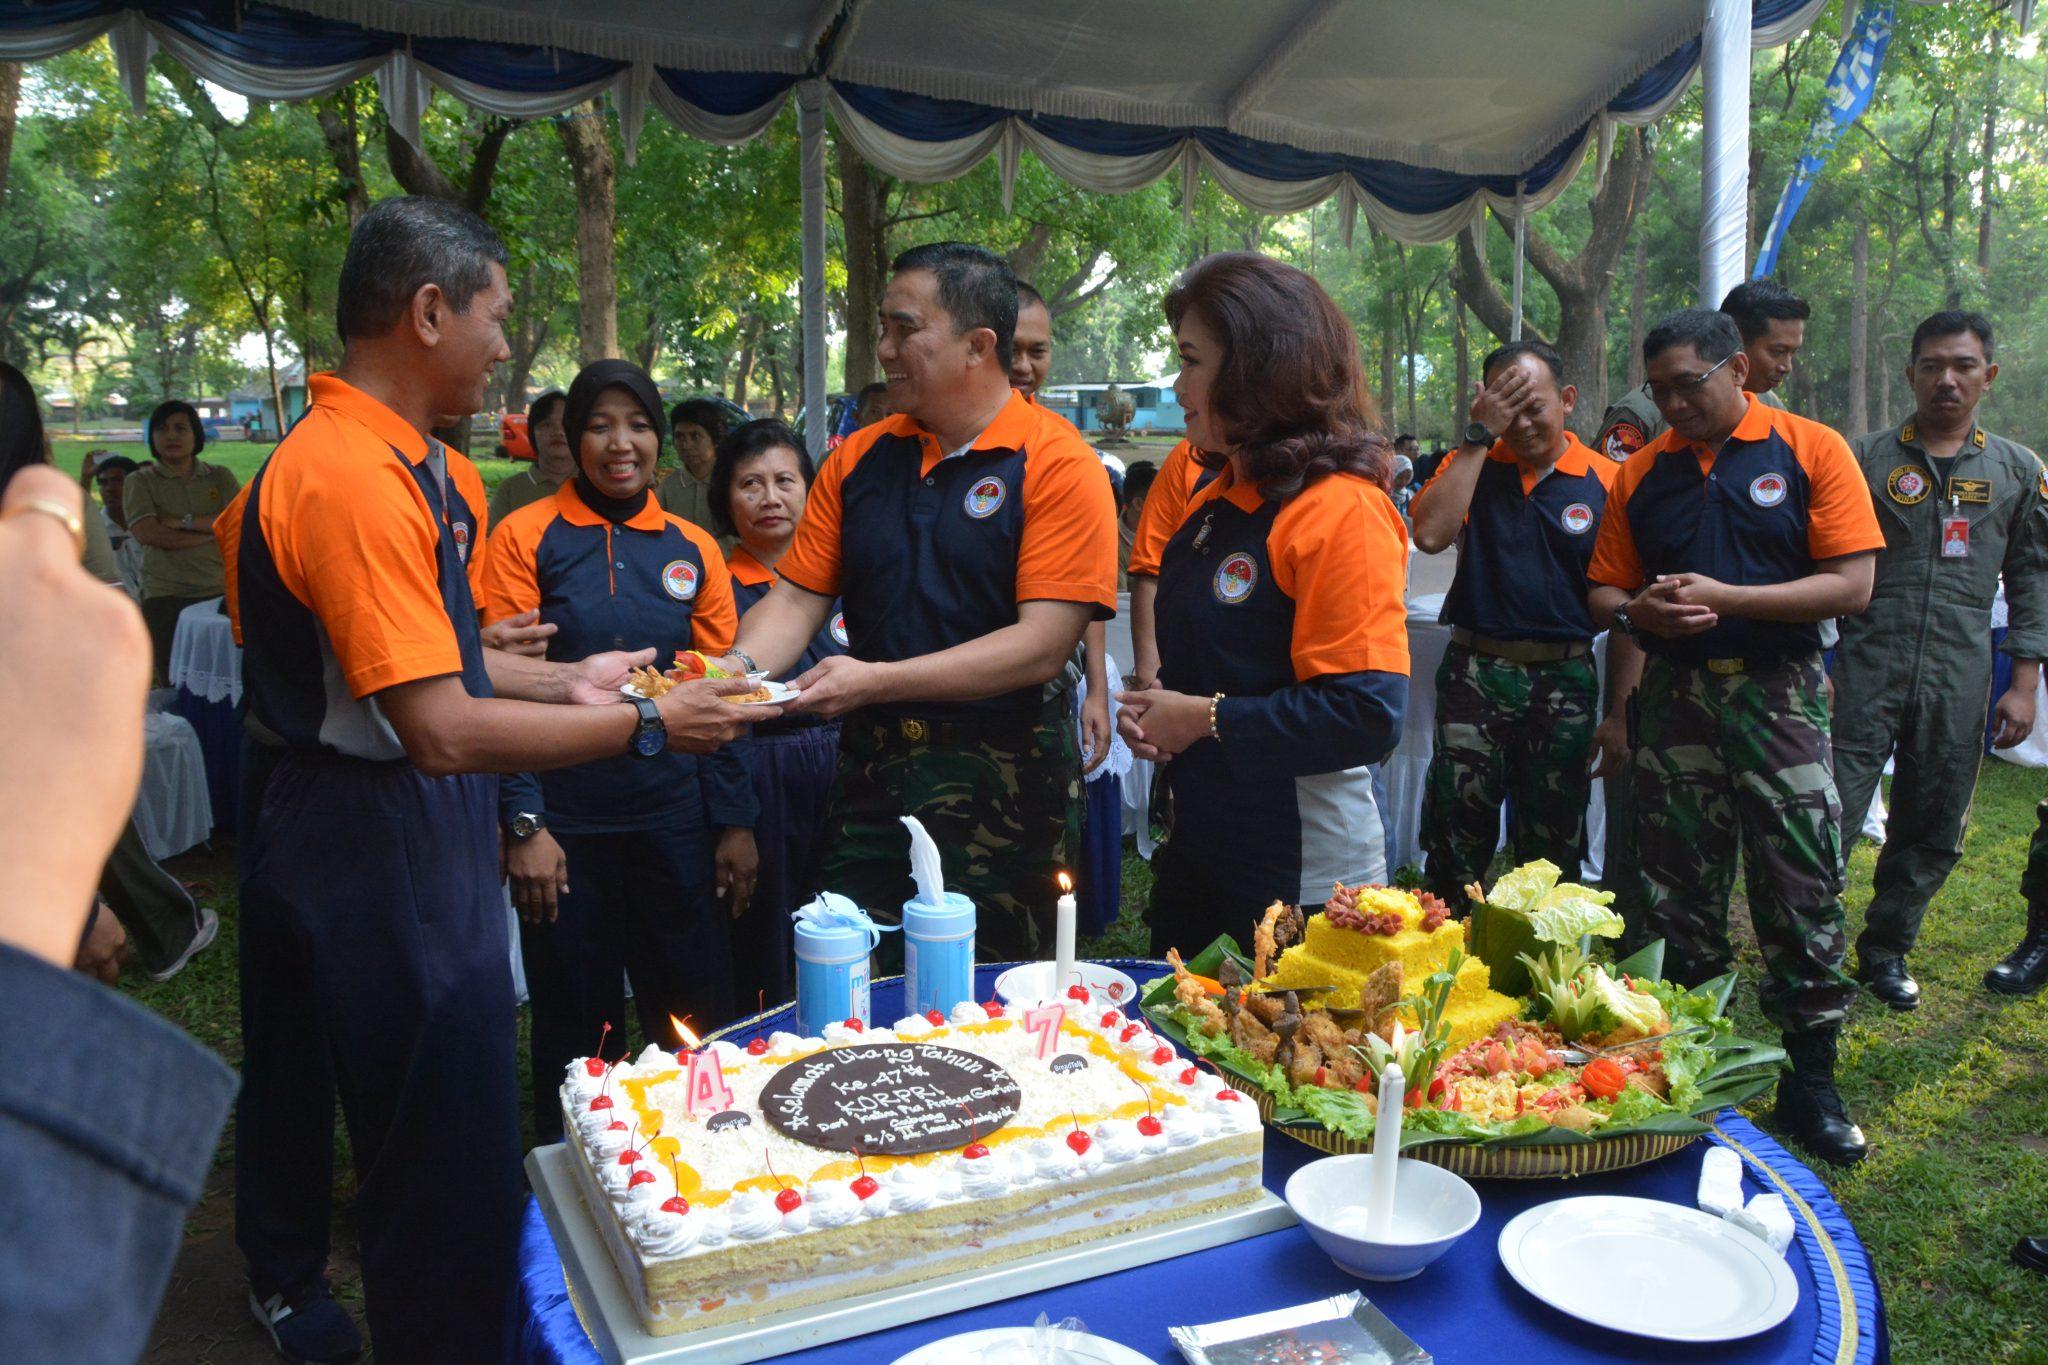 Tepat 47 Tahun Korpri, PNS Lanud Iswahjudi Gelar Syukuran dan Panggung Gembira